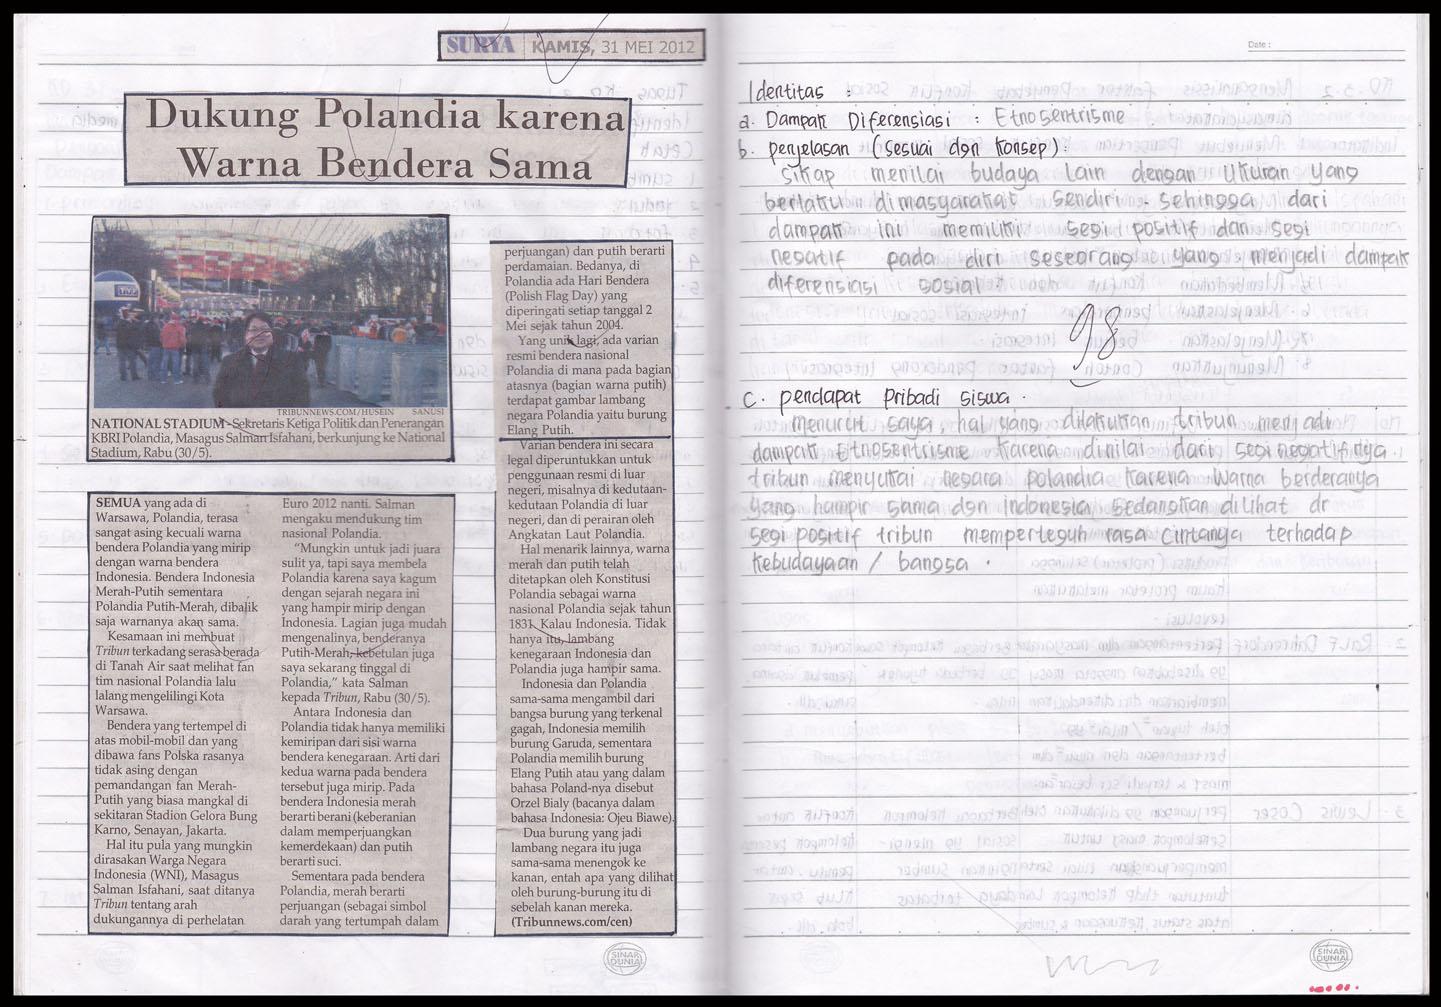 Contoh Berita Di Media Cetak Contoh Surat Berita Acara Kehilangan Barang Perusahaan Contoh Tugas Kd32 Kelas Xi Ips